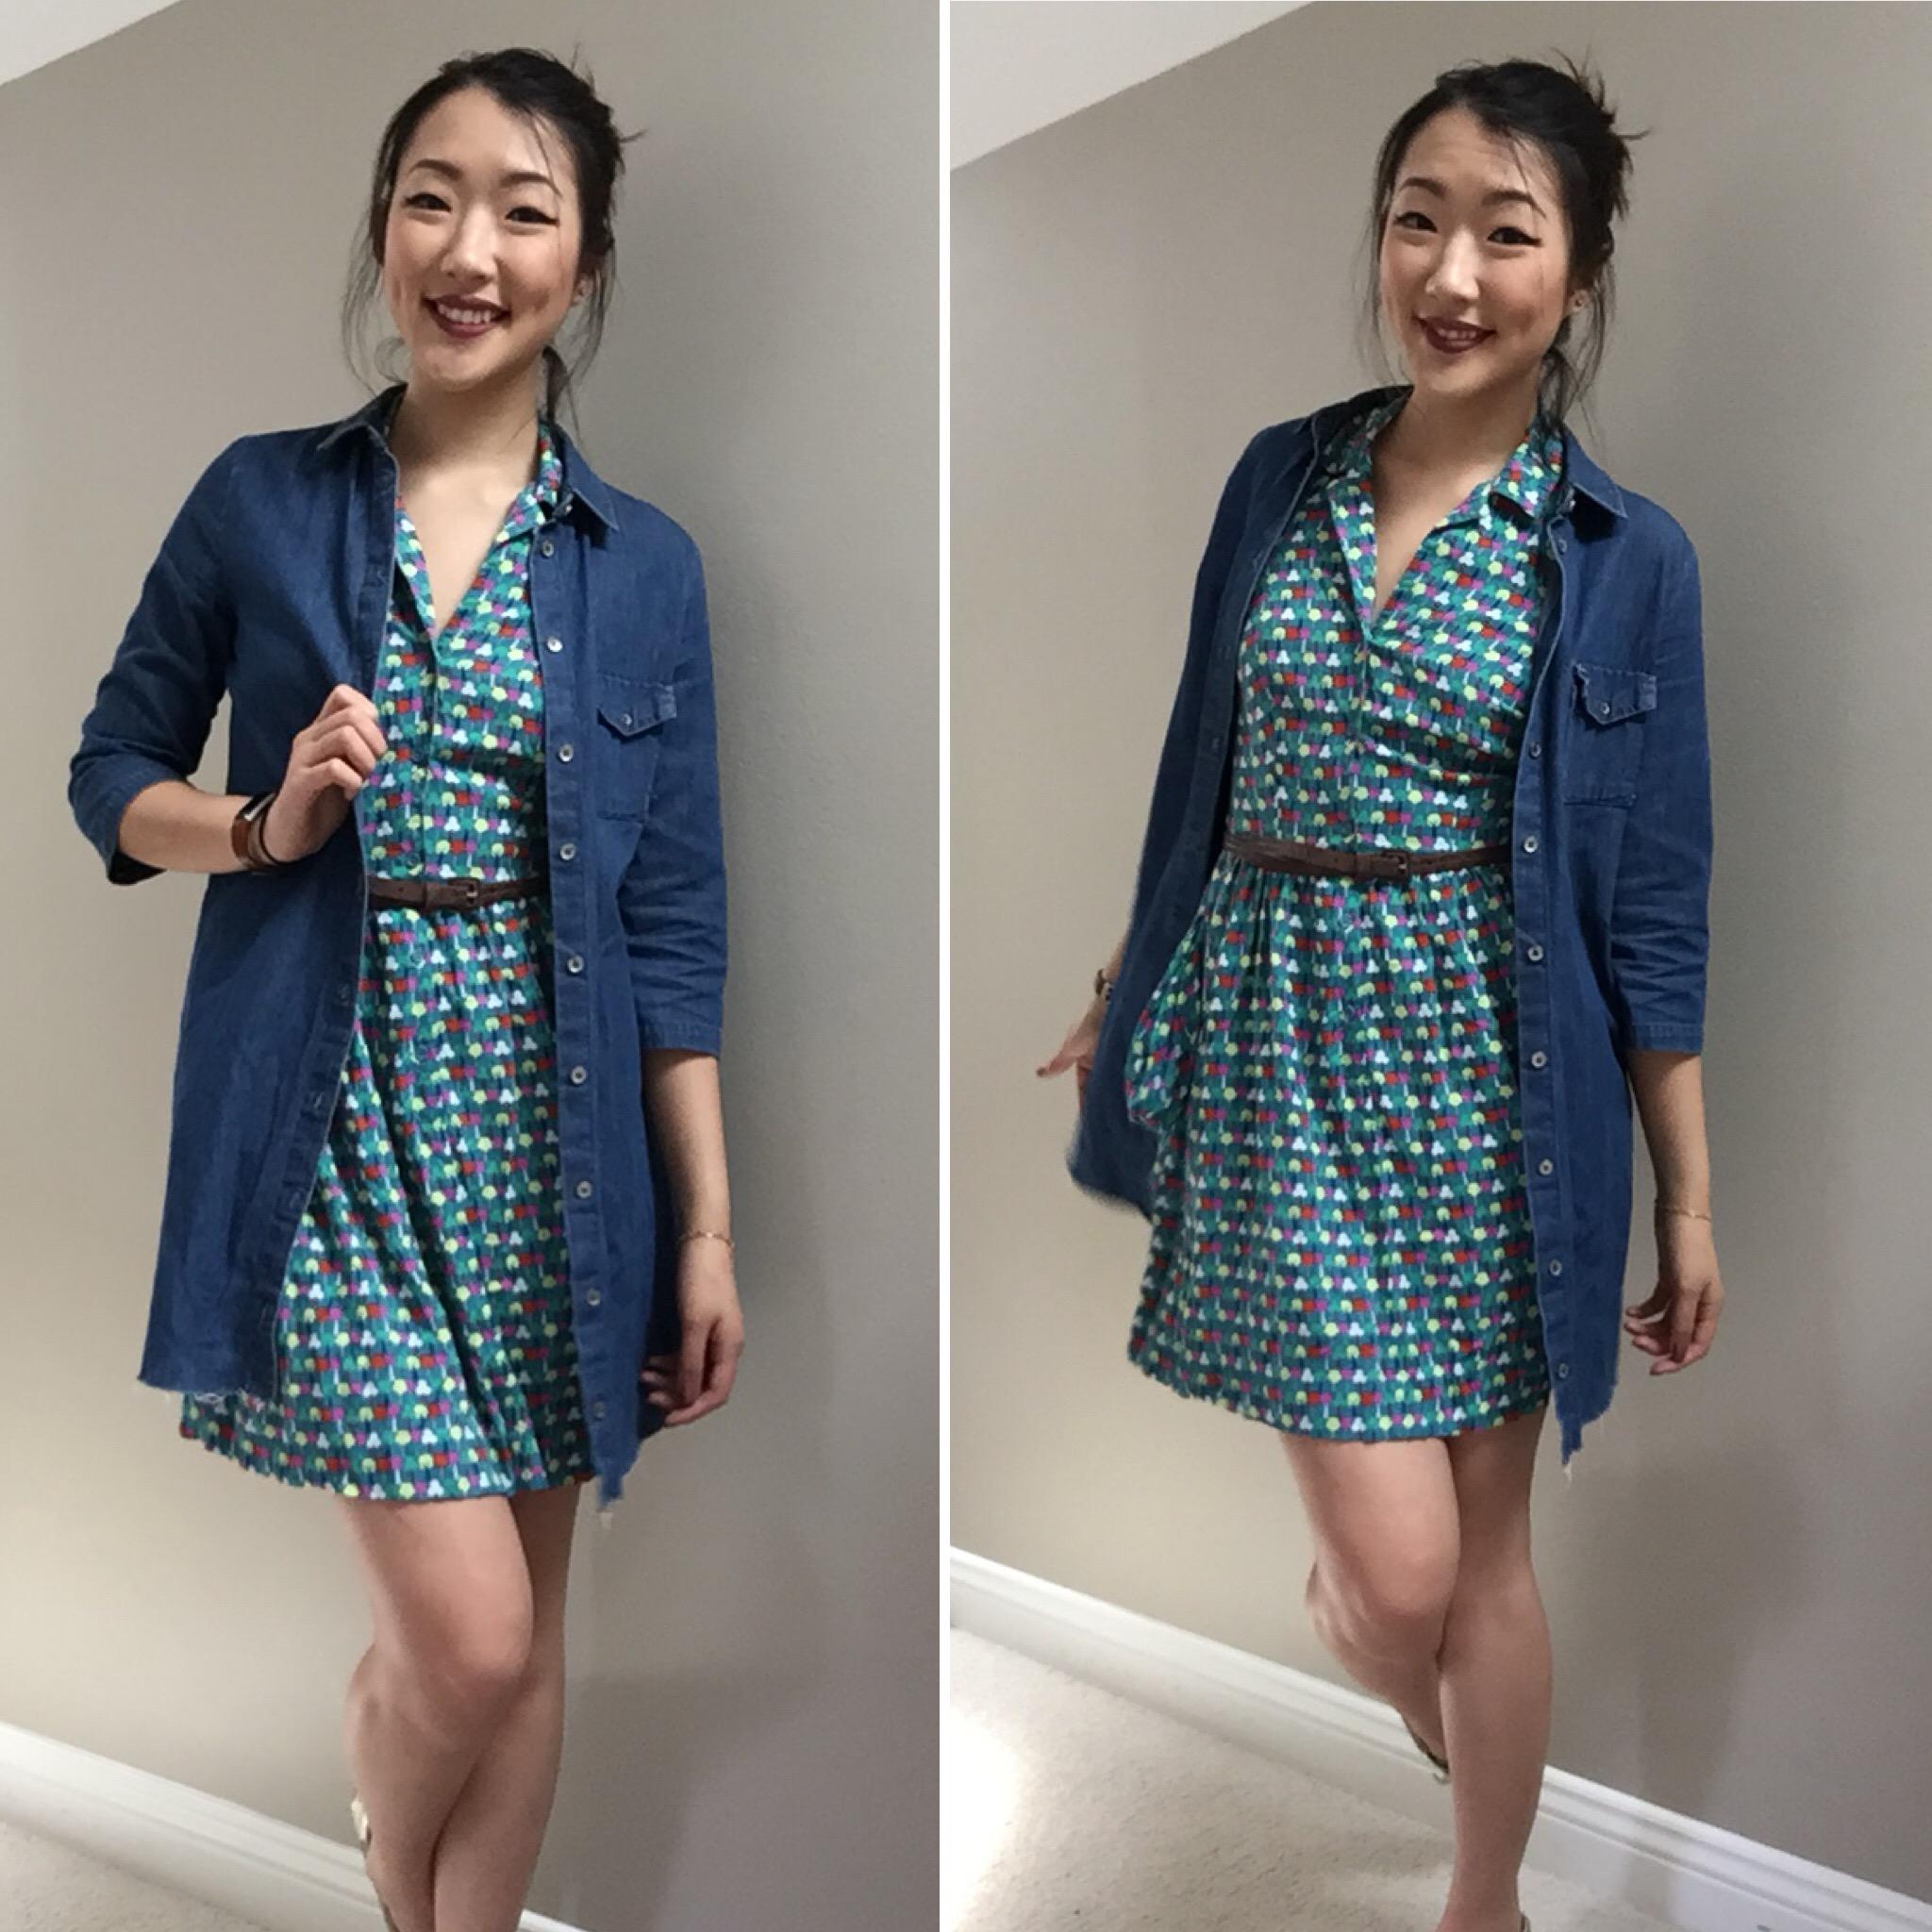 Colorful Dress: Target / Denim Dress: Zara / Shoes: Sperry / Lipstick: Colour Pop